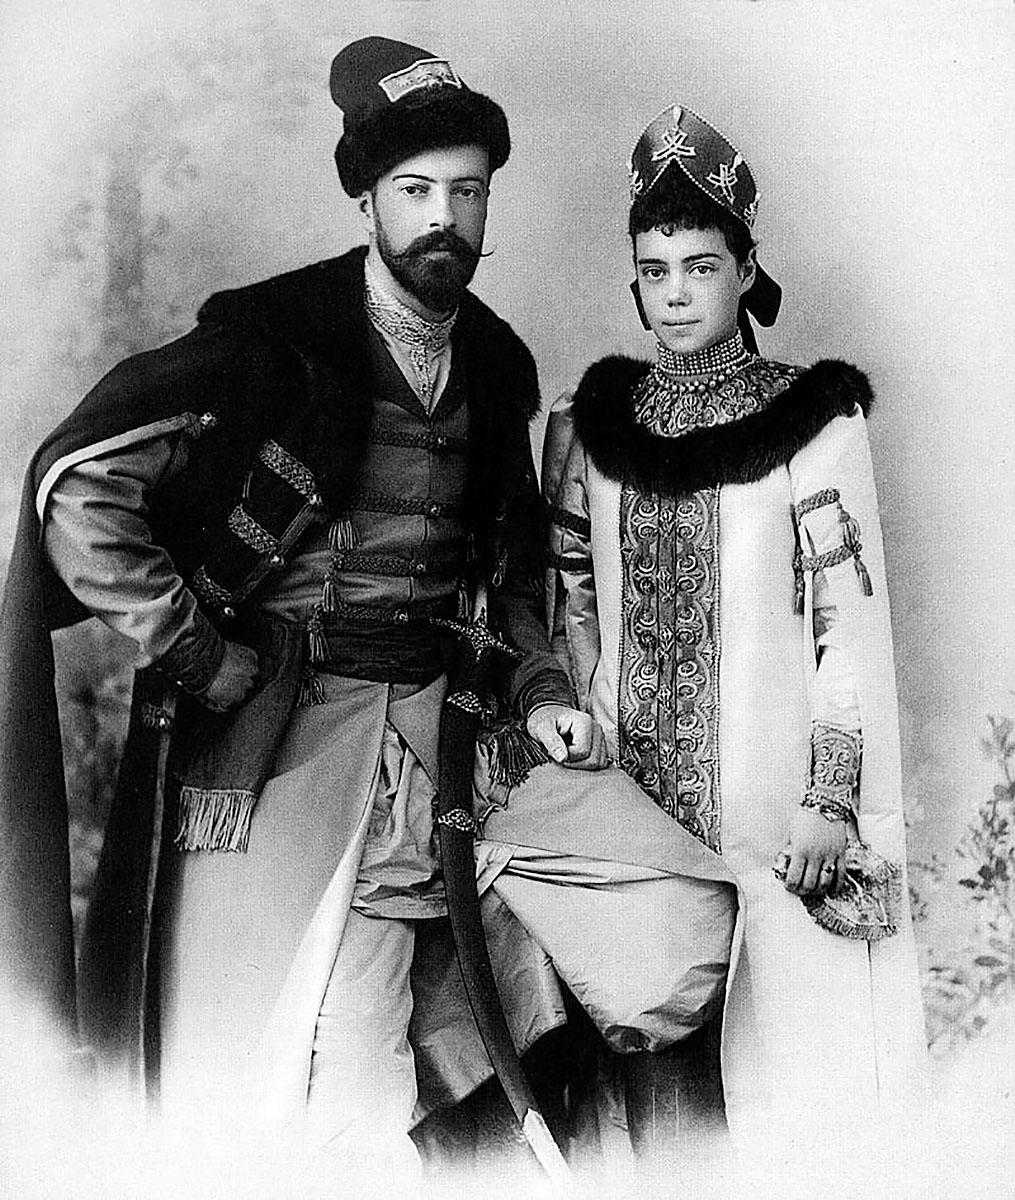 Ксения Александровна с мужем Александром Михайловичем в русских костюмах